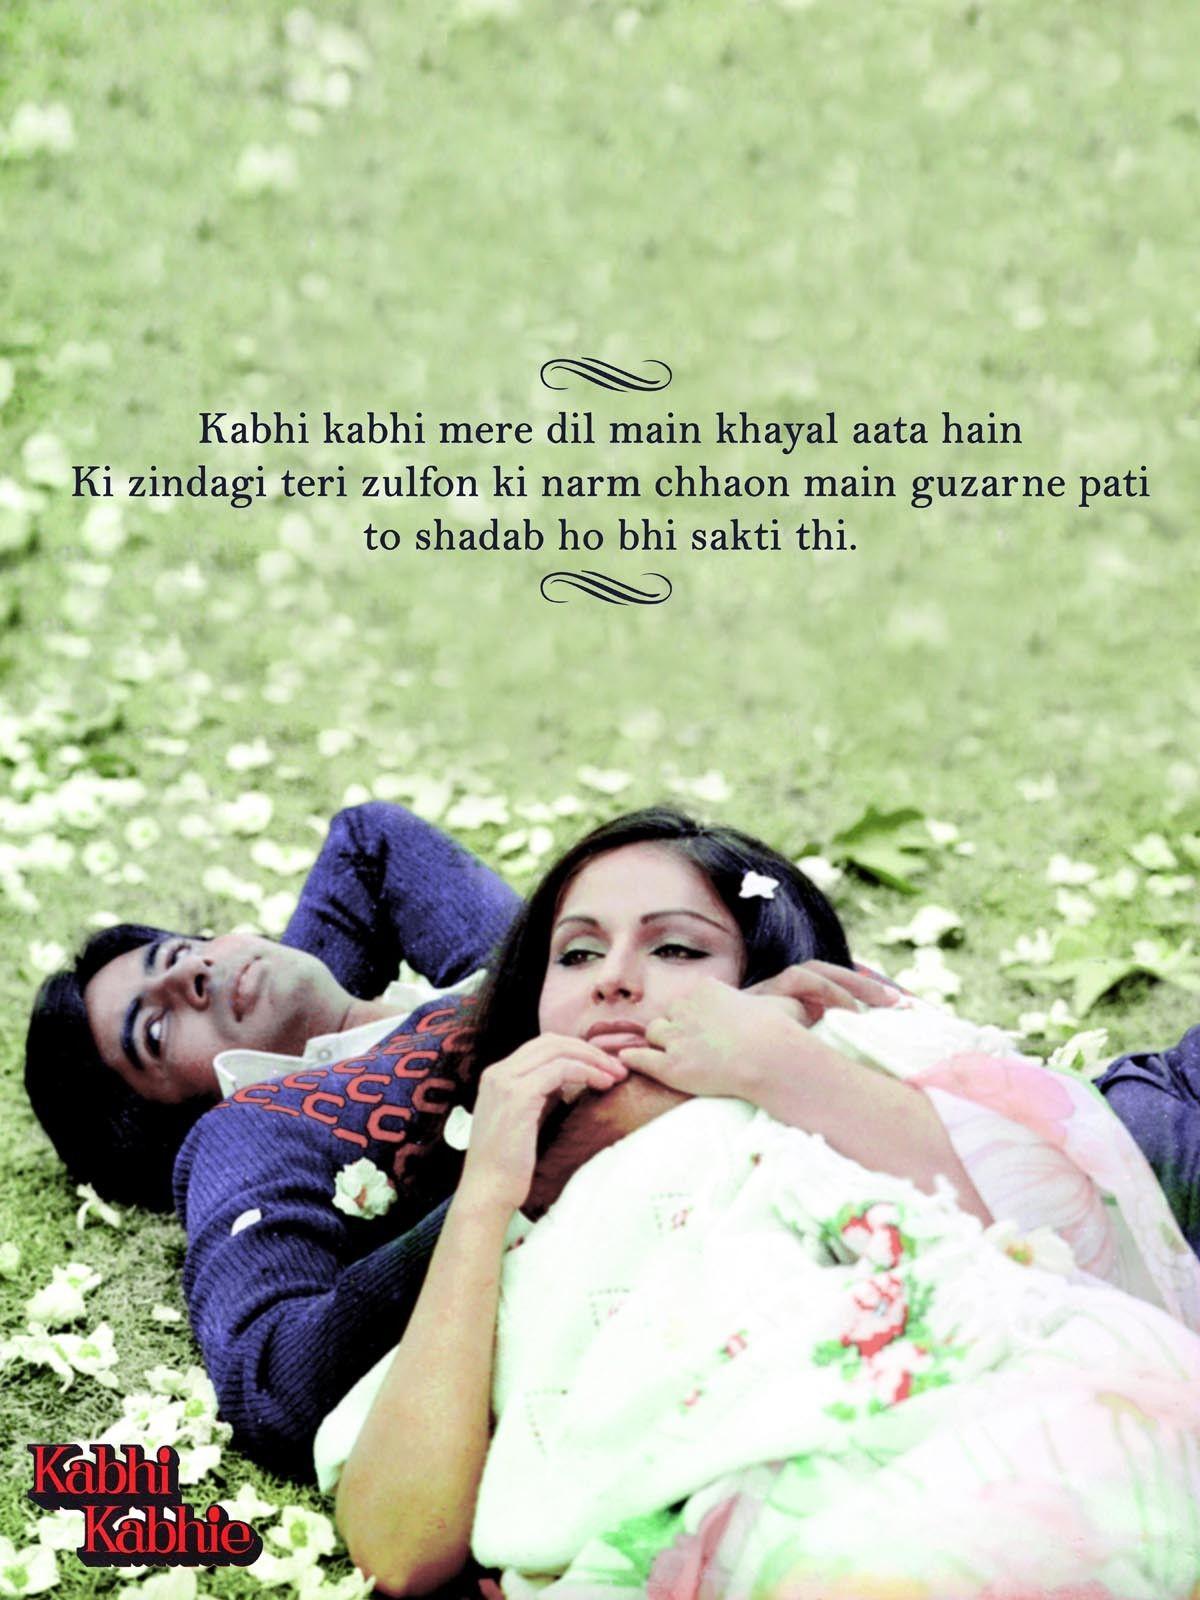 Image result for amitabh bachchan grass kabhi kabhi